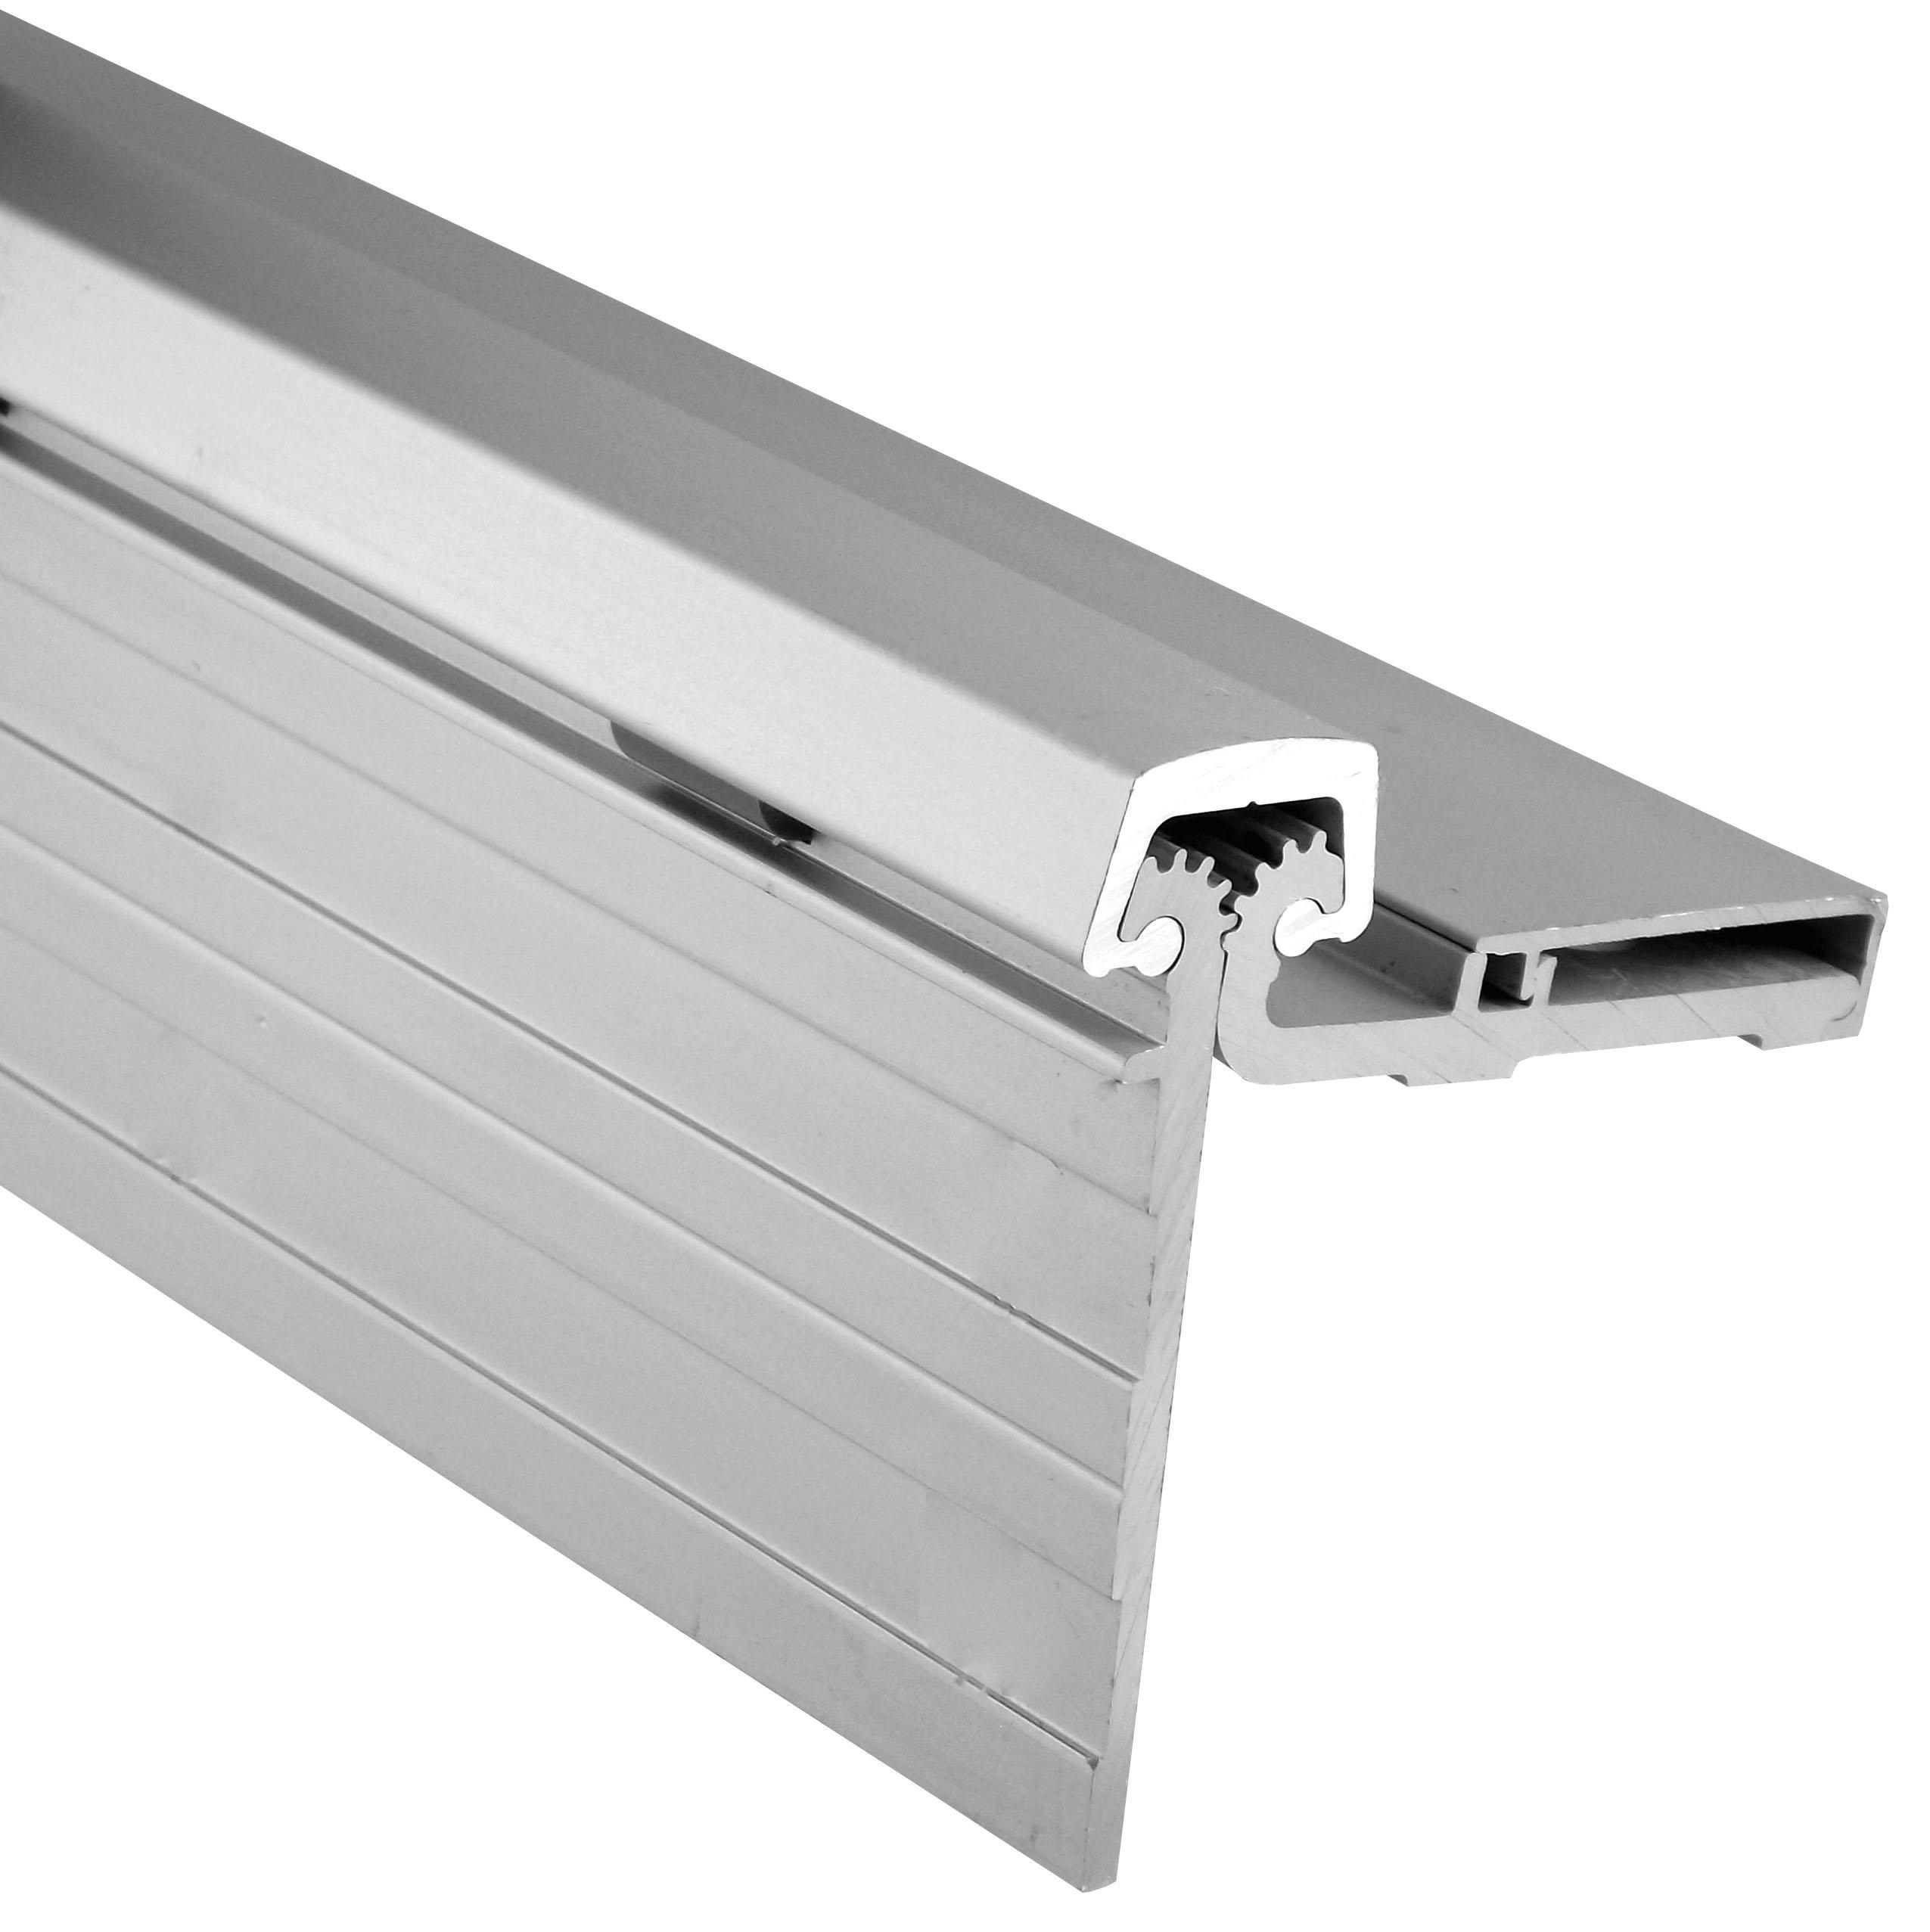 Pemko Standard Duty Half Surface Hinge, Clear Anodized Aluminum, 83''L